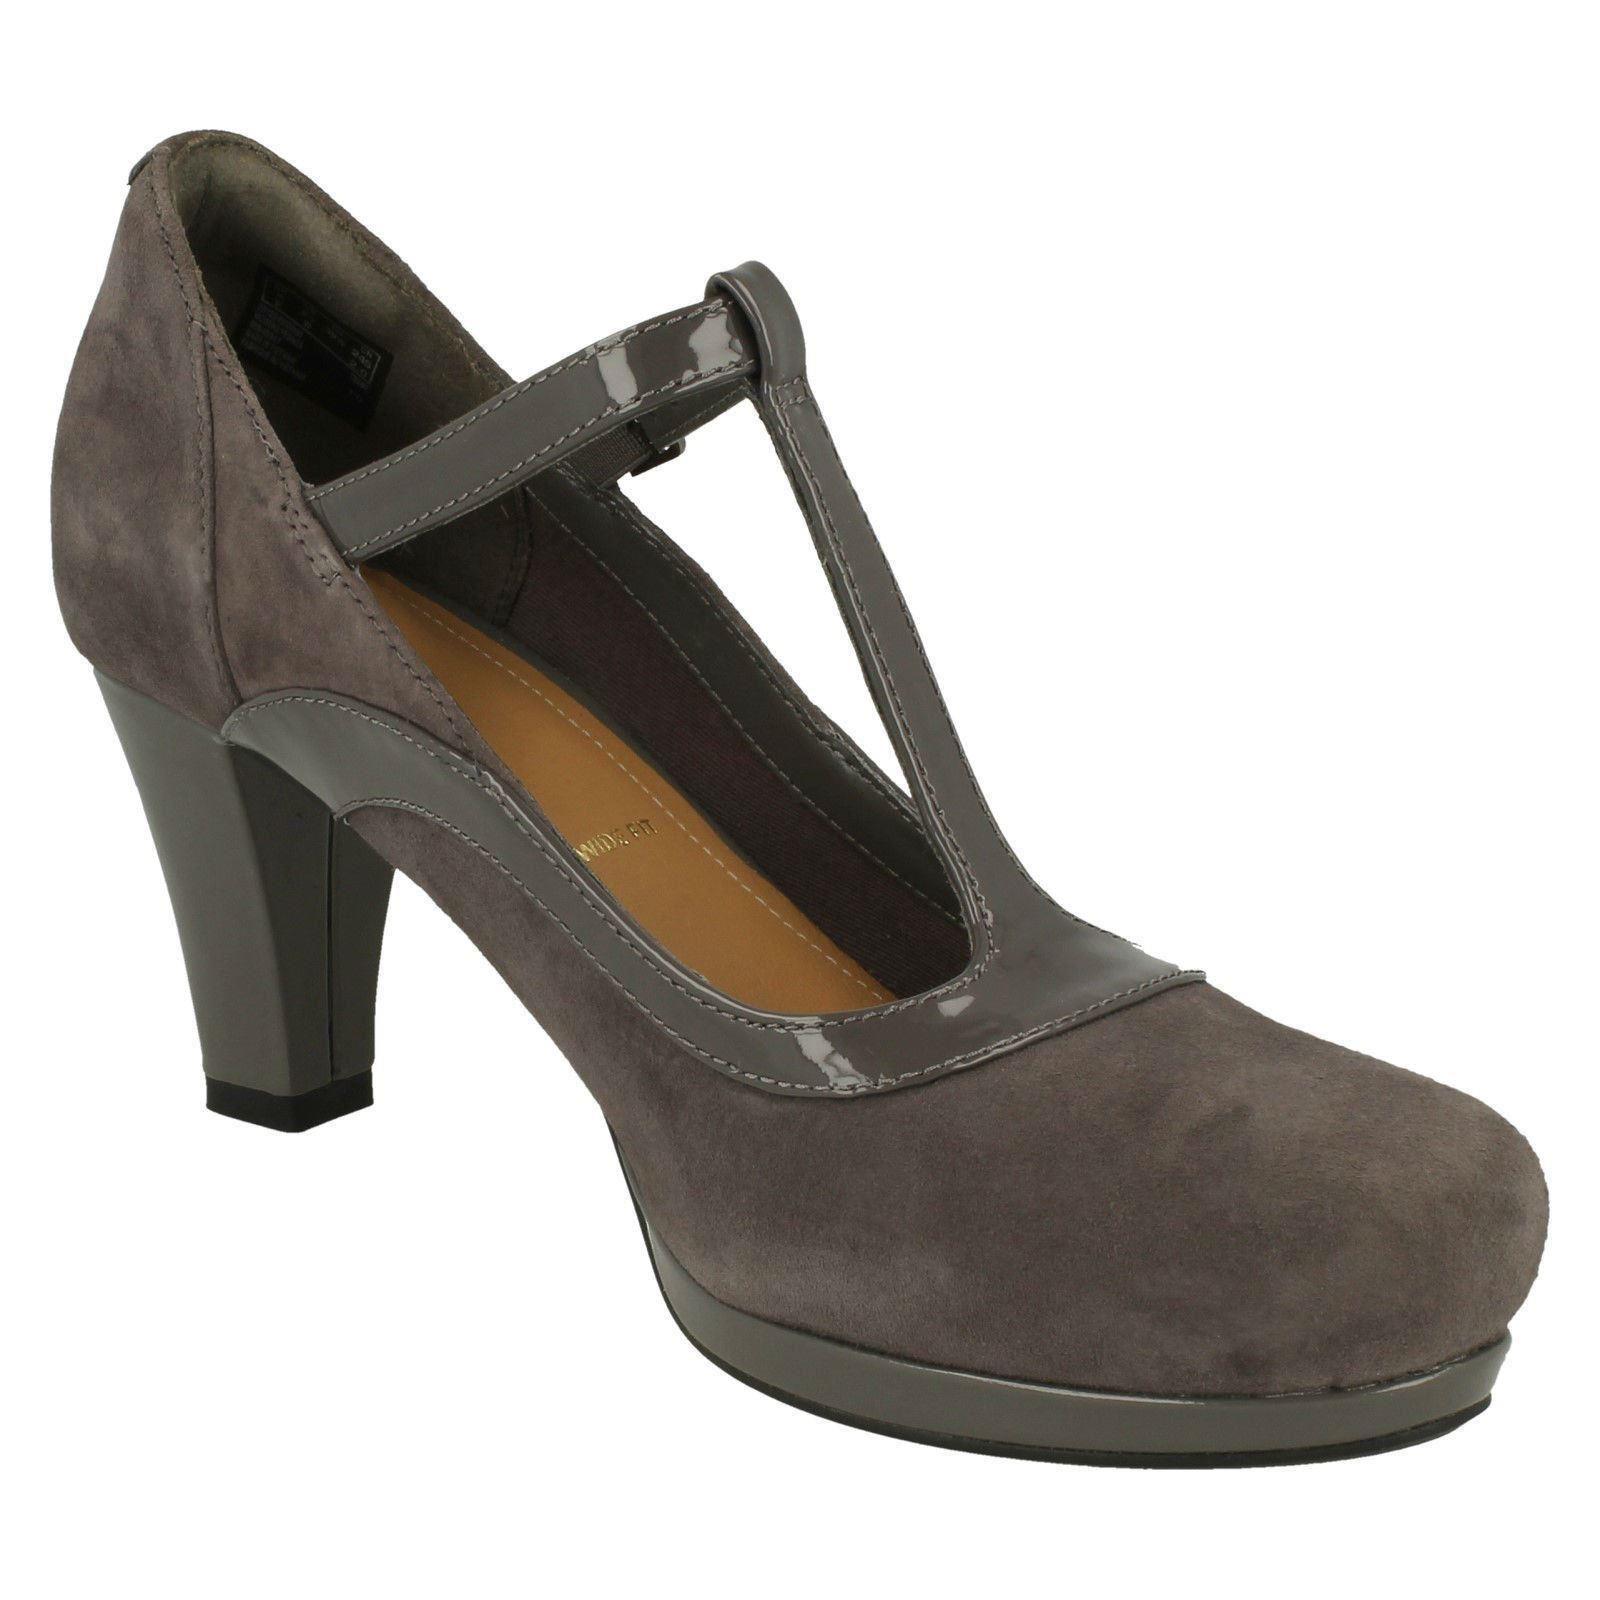 Clarks Girls Chorus Pitch T-Clip Court Shoes